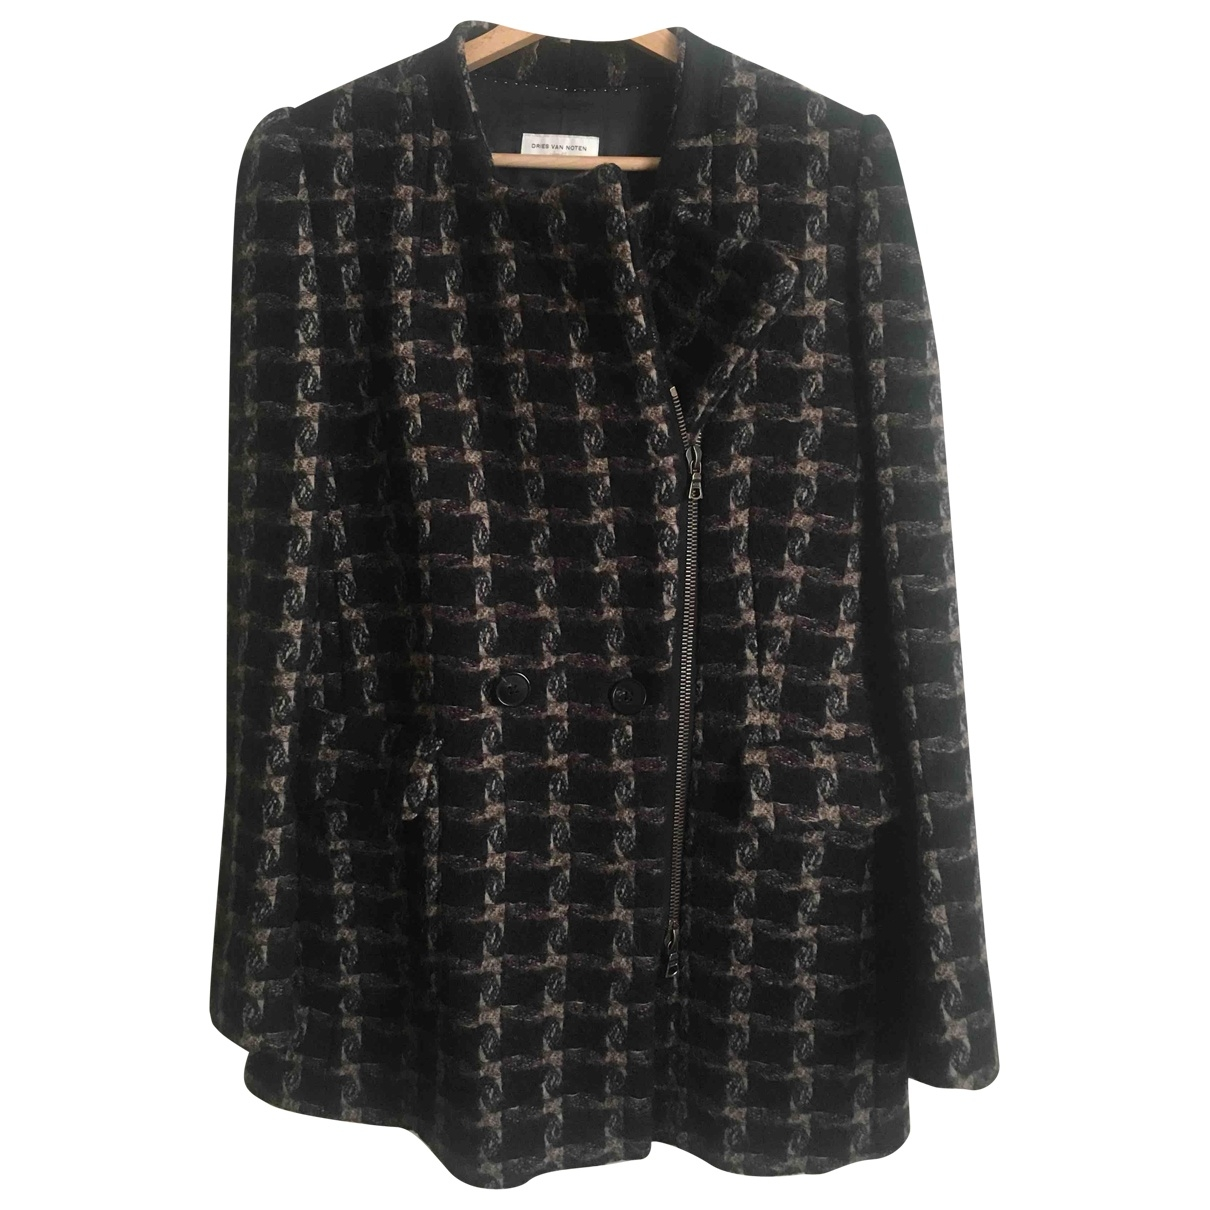 Dries Van Noten \N Black Wool jacket for Women 40 IT